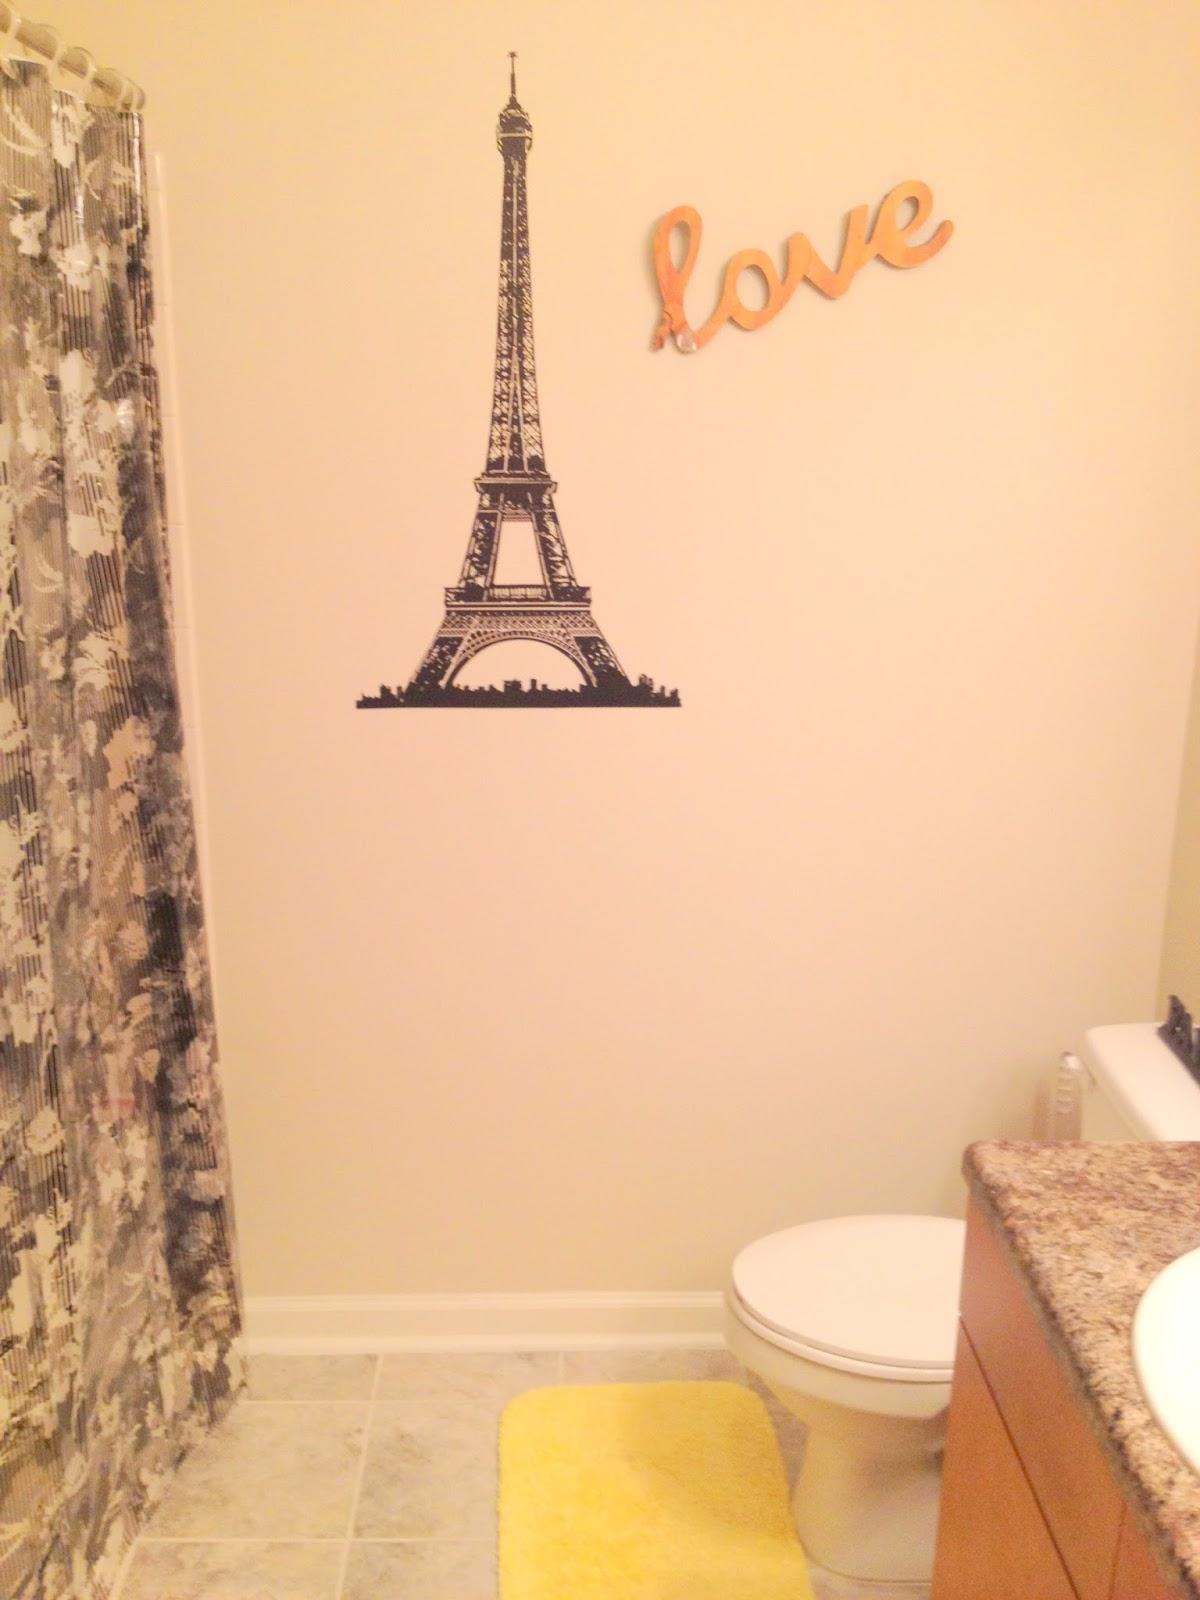 Bathroom Decor Part 1